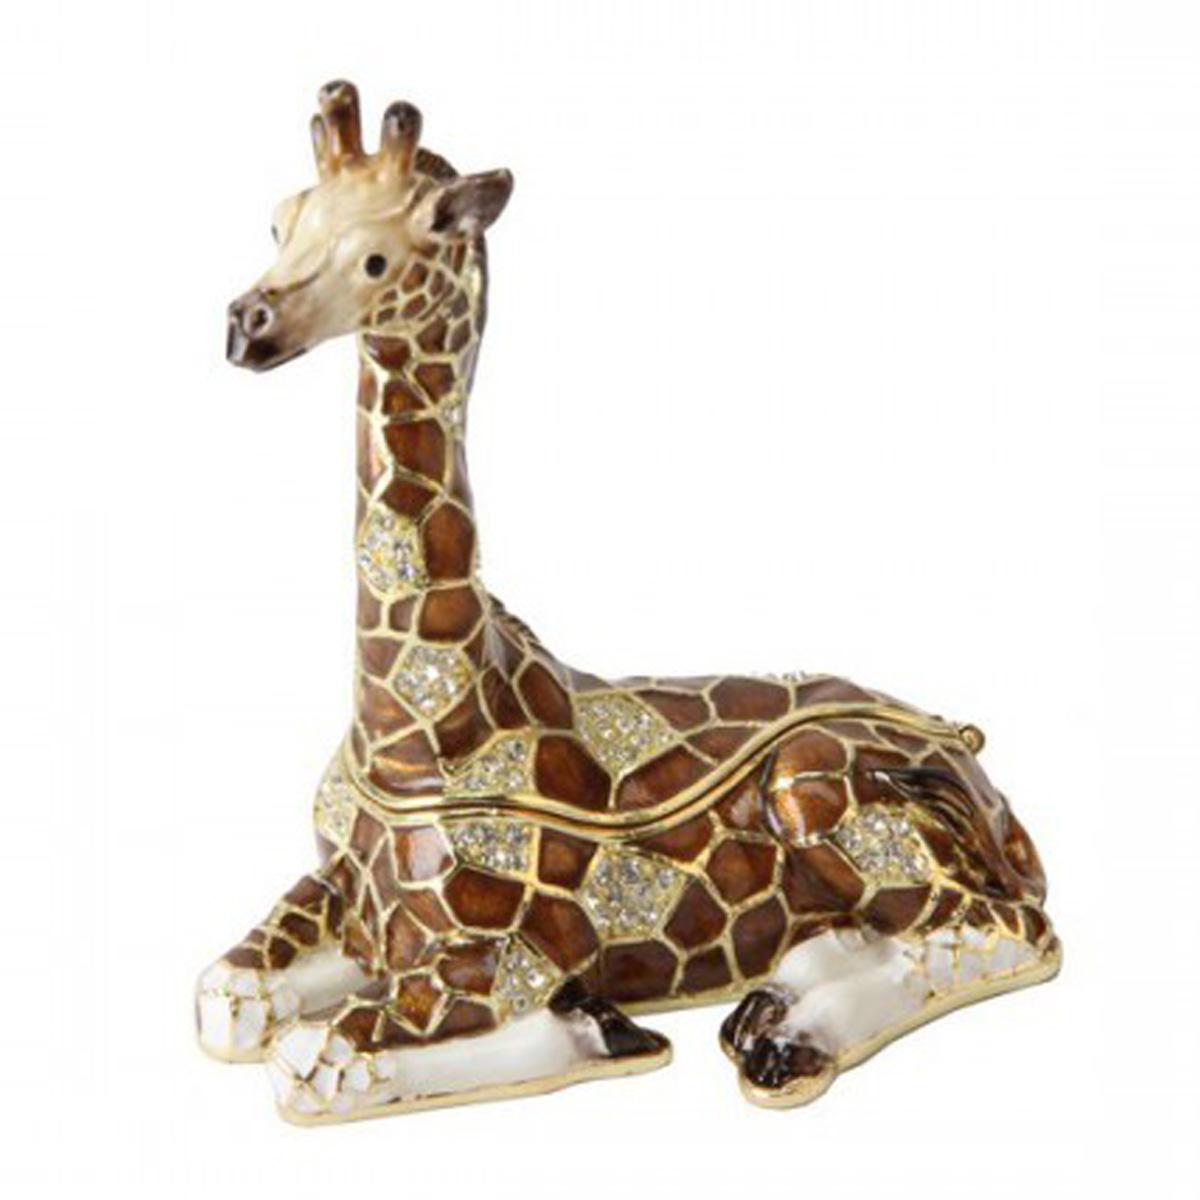 Coffret à Bijoux \'Girafe\' marron - 9x8x5 cm - [Q5999]